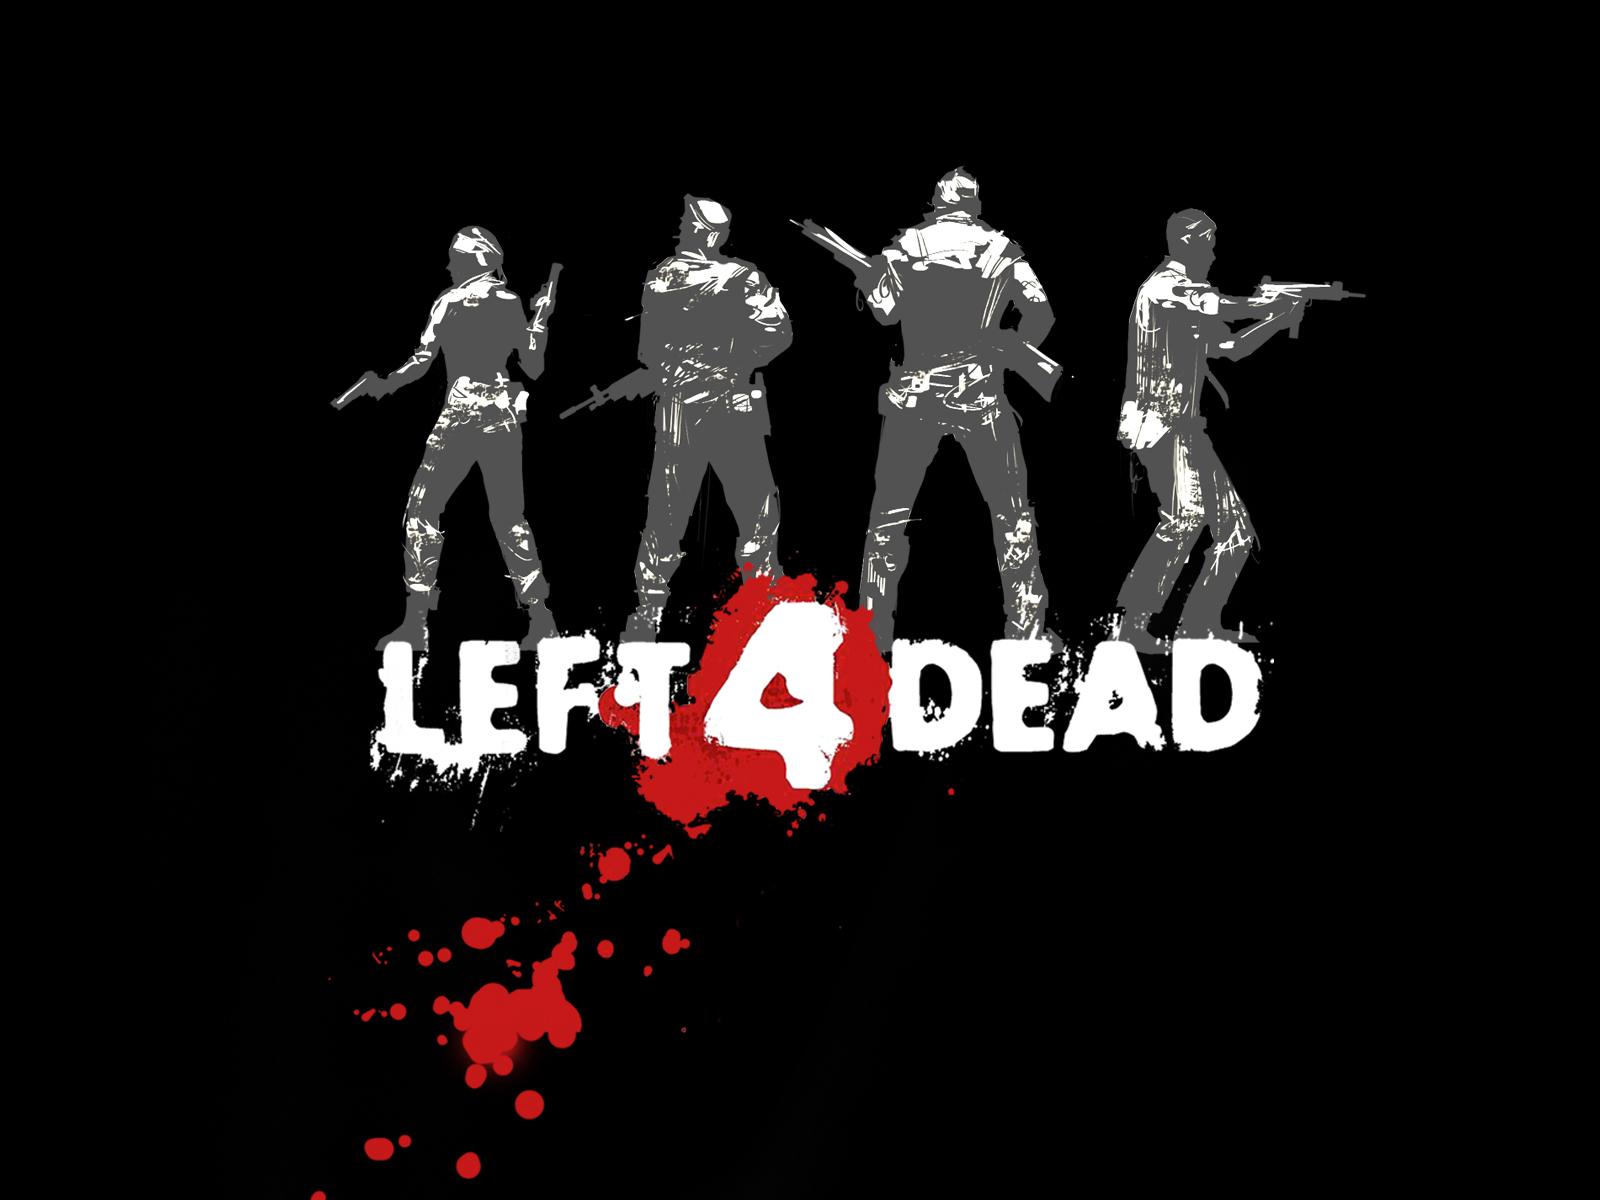 Imágenes De Left 4 Dead